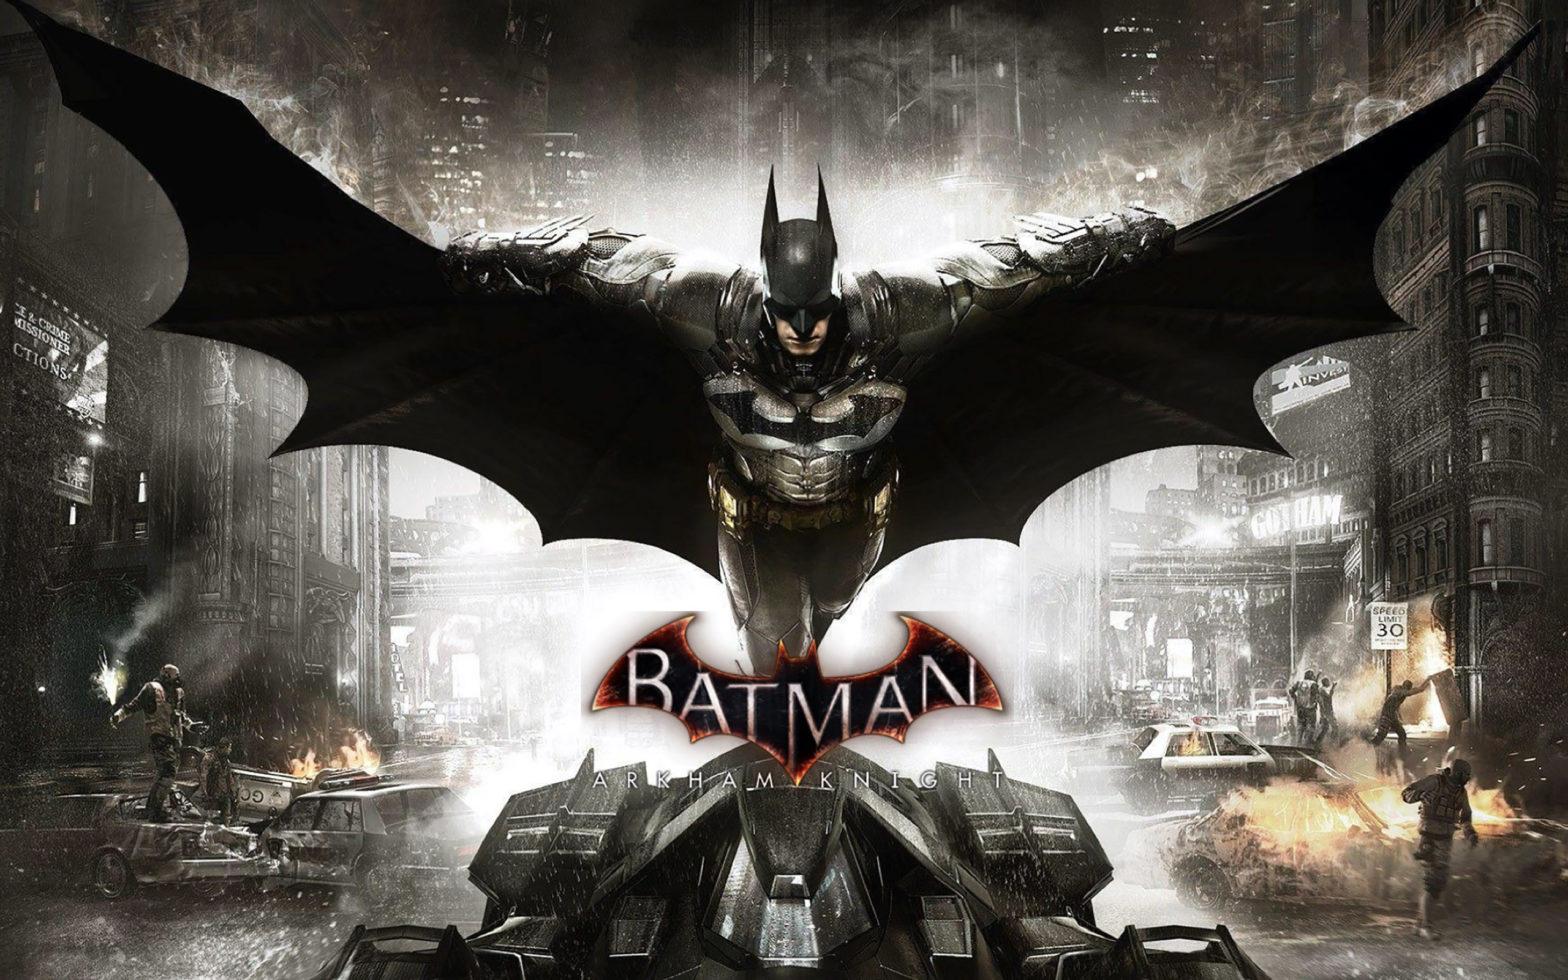 Batman - Arkham Knight Teaser